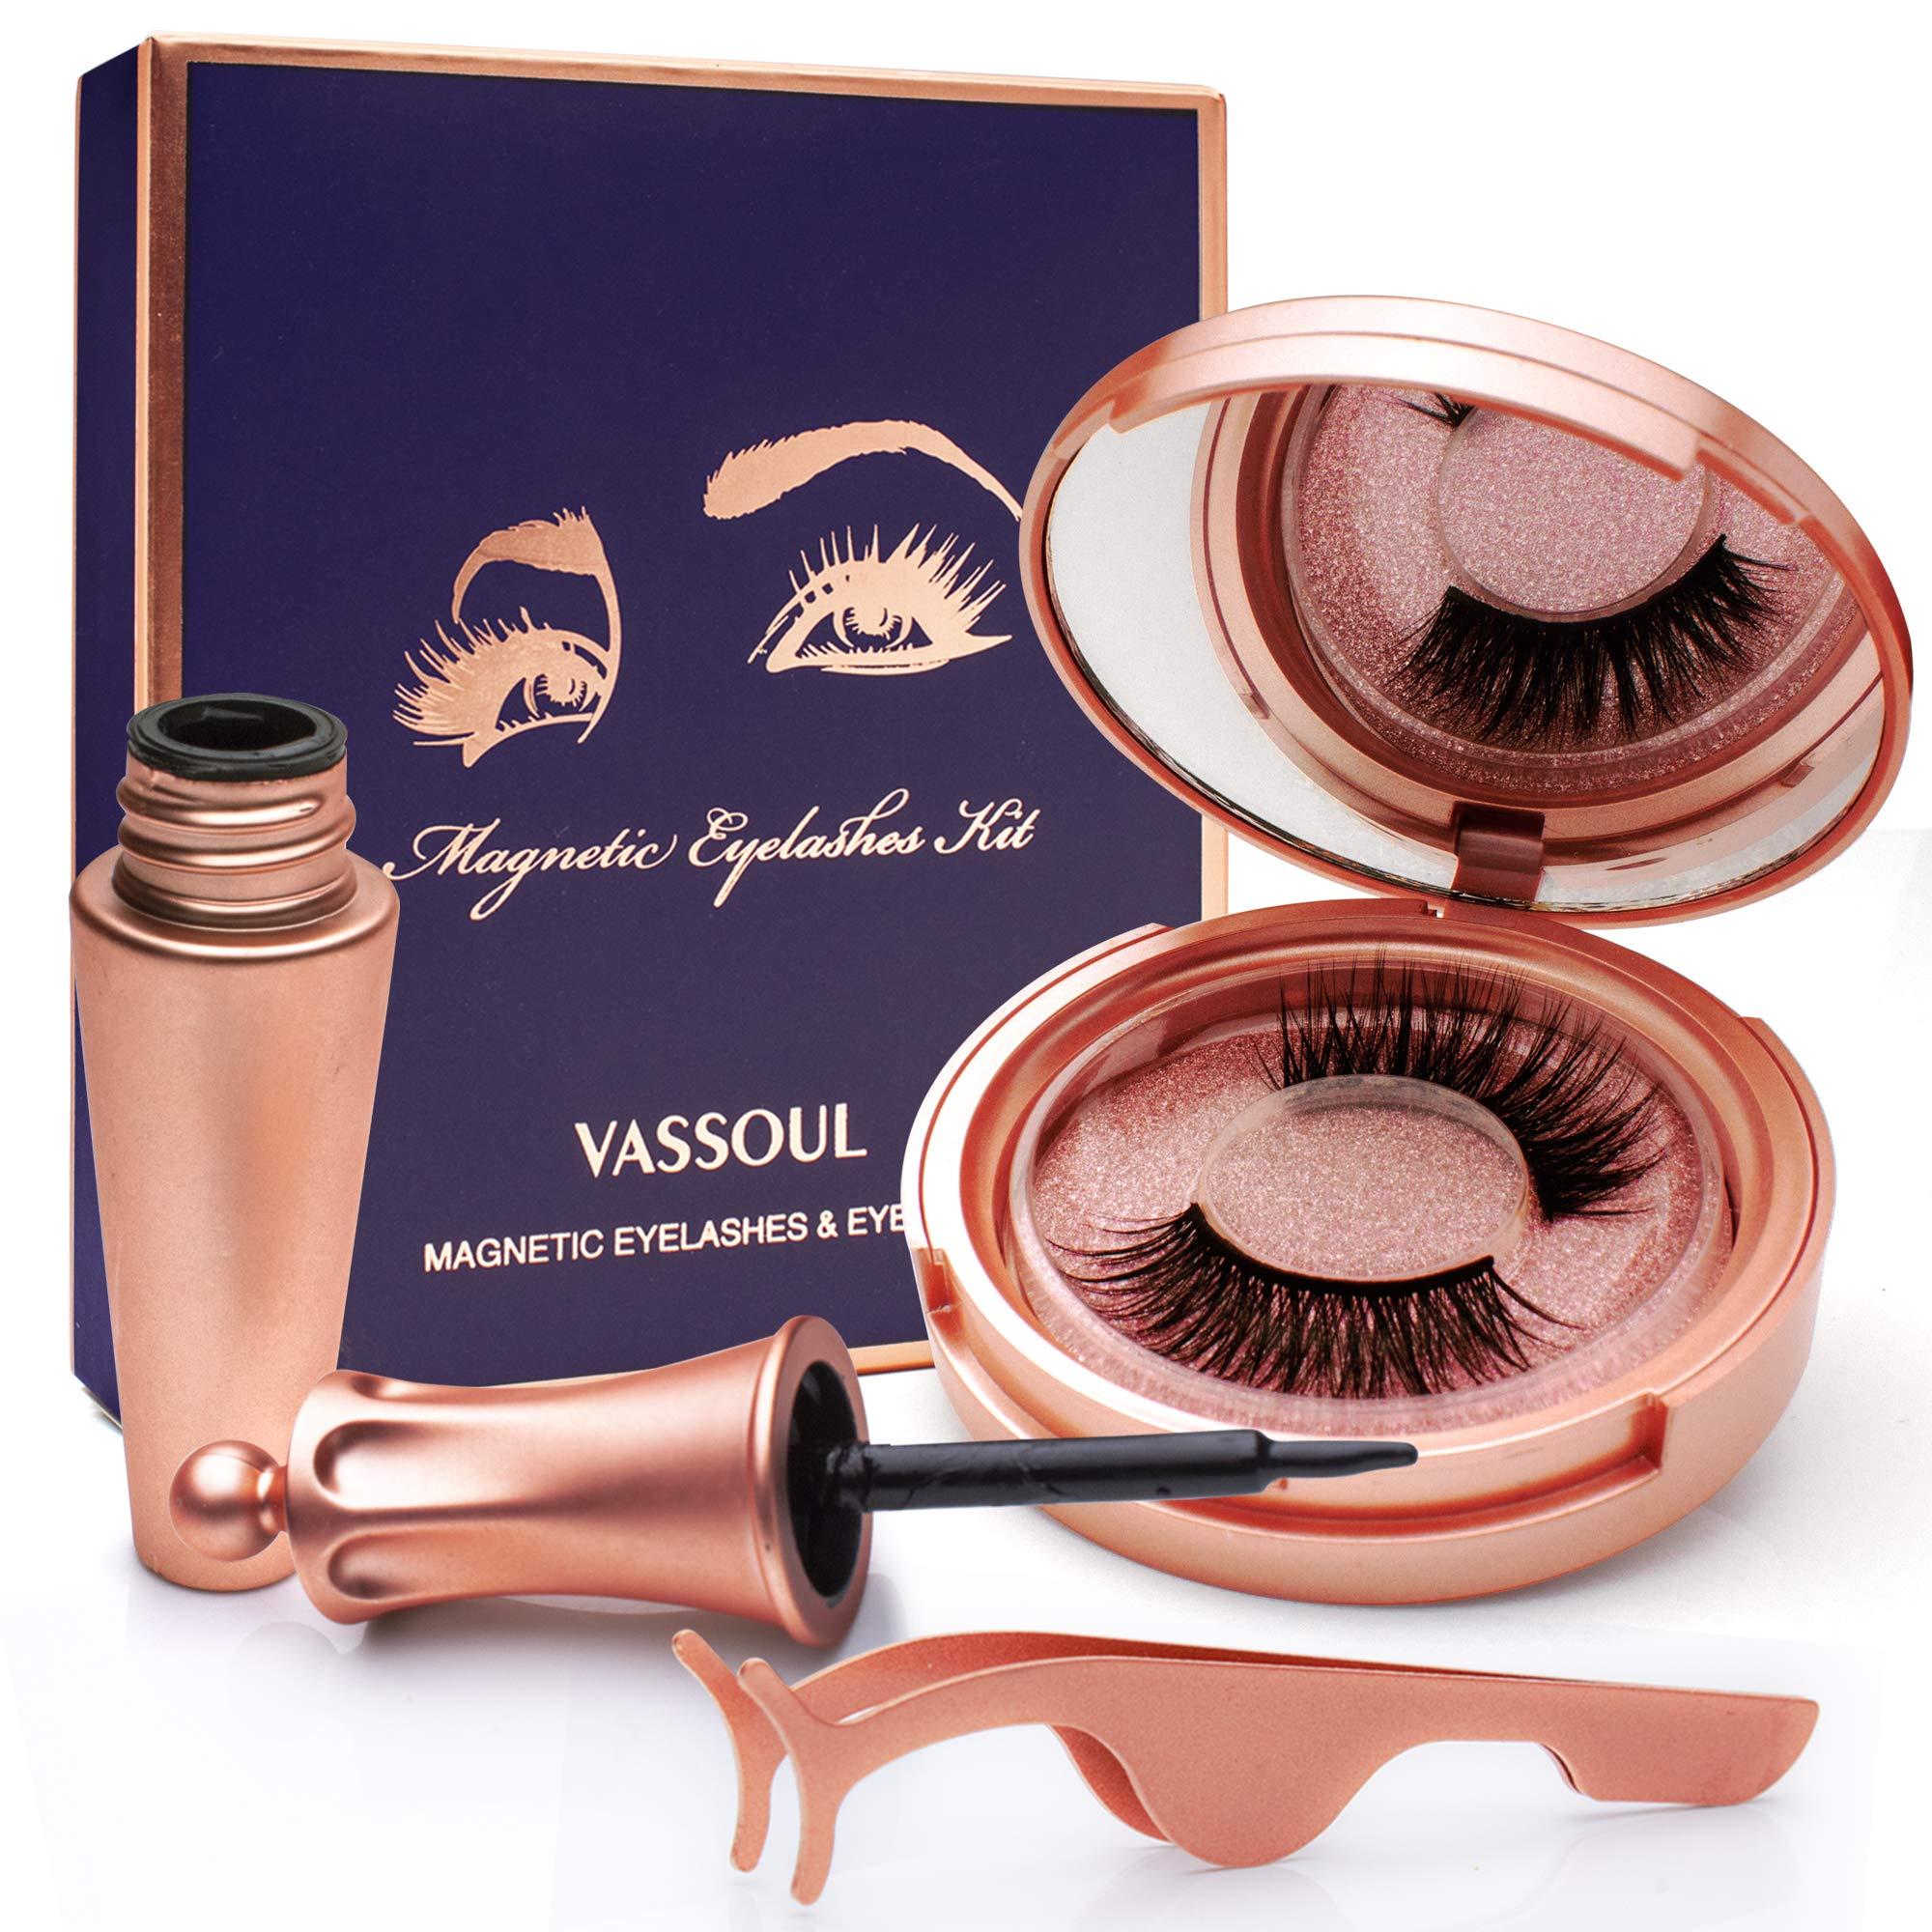 VASSOUL Magnetic Eyelashes With Eyeliner, Magnetic Eyeliner And Lashes, Magnetic Eyeliners With Advanced 3D Magnetic Eyelash, Magnetic lashliner, And Applicator by VASSOUL